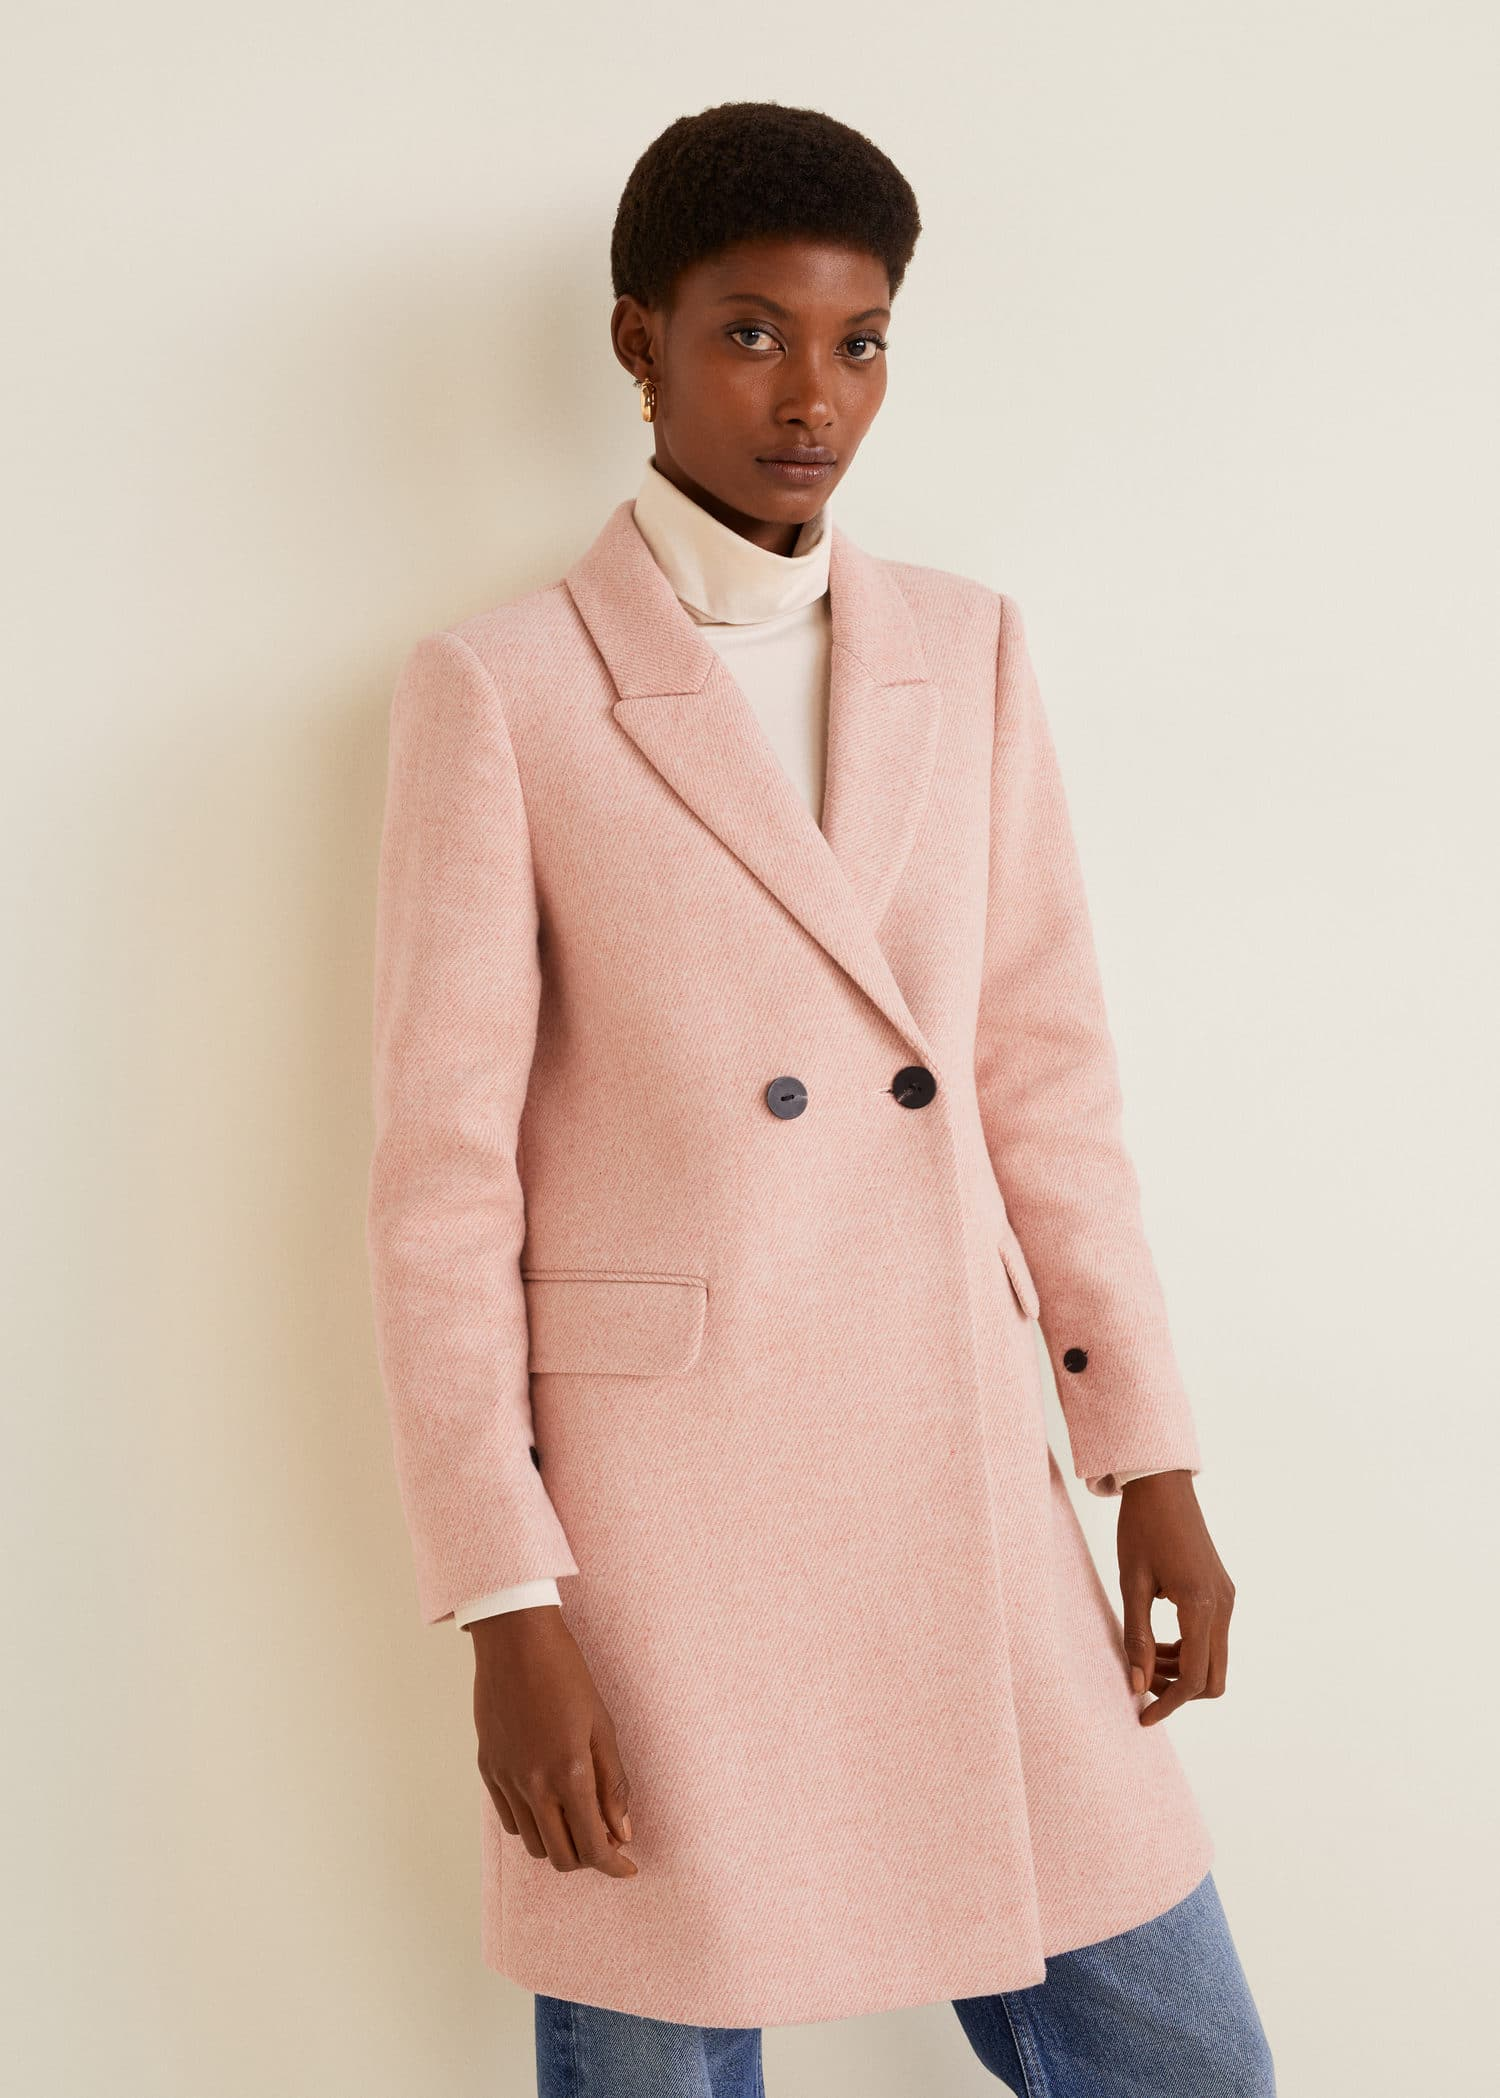 Masculine United WomenMango Structured Coat Kingdom 0OPkwX8n